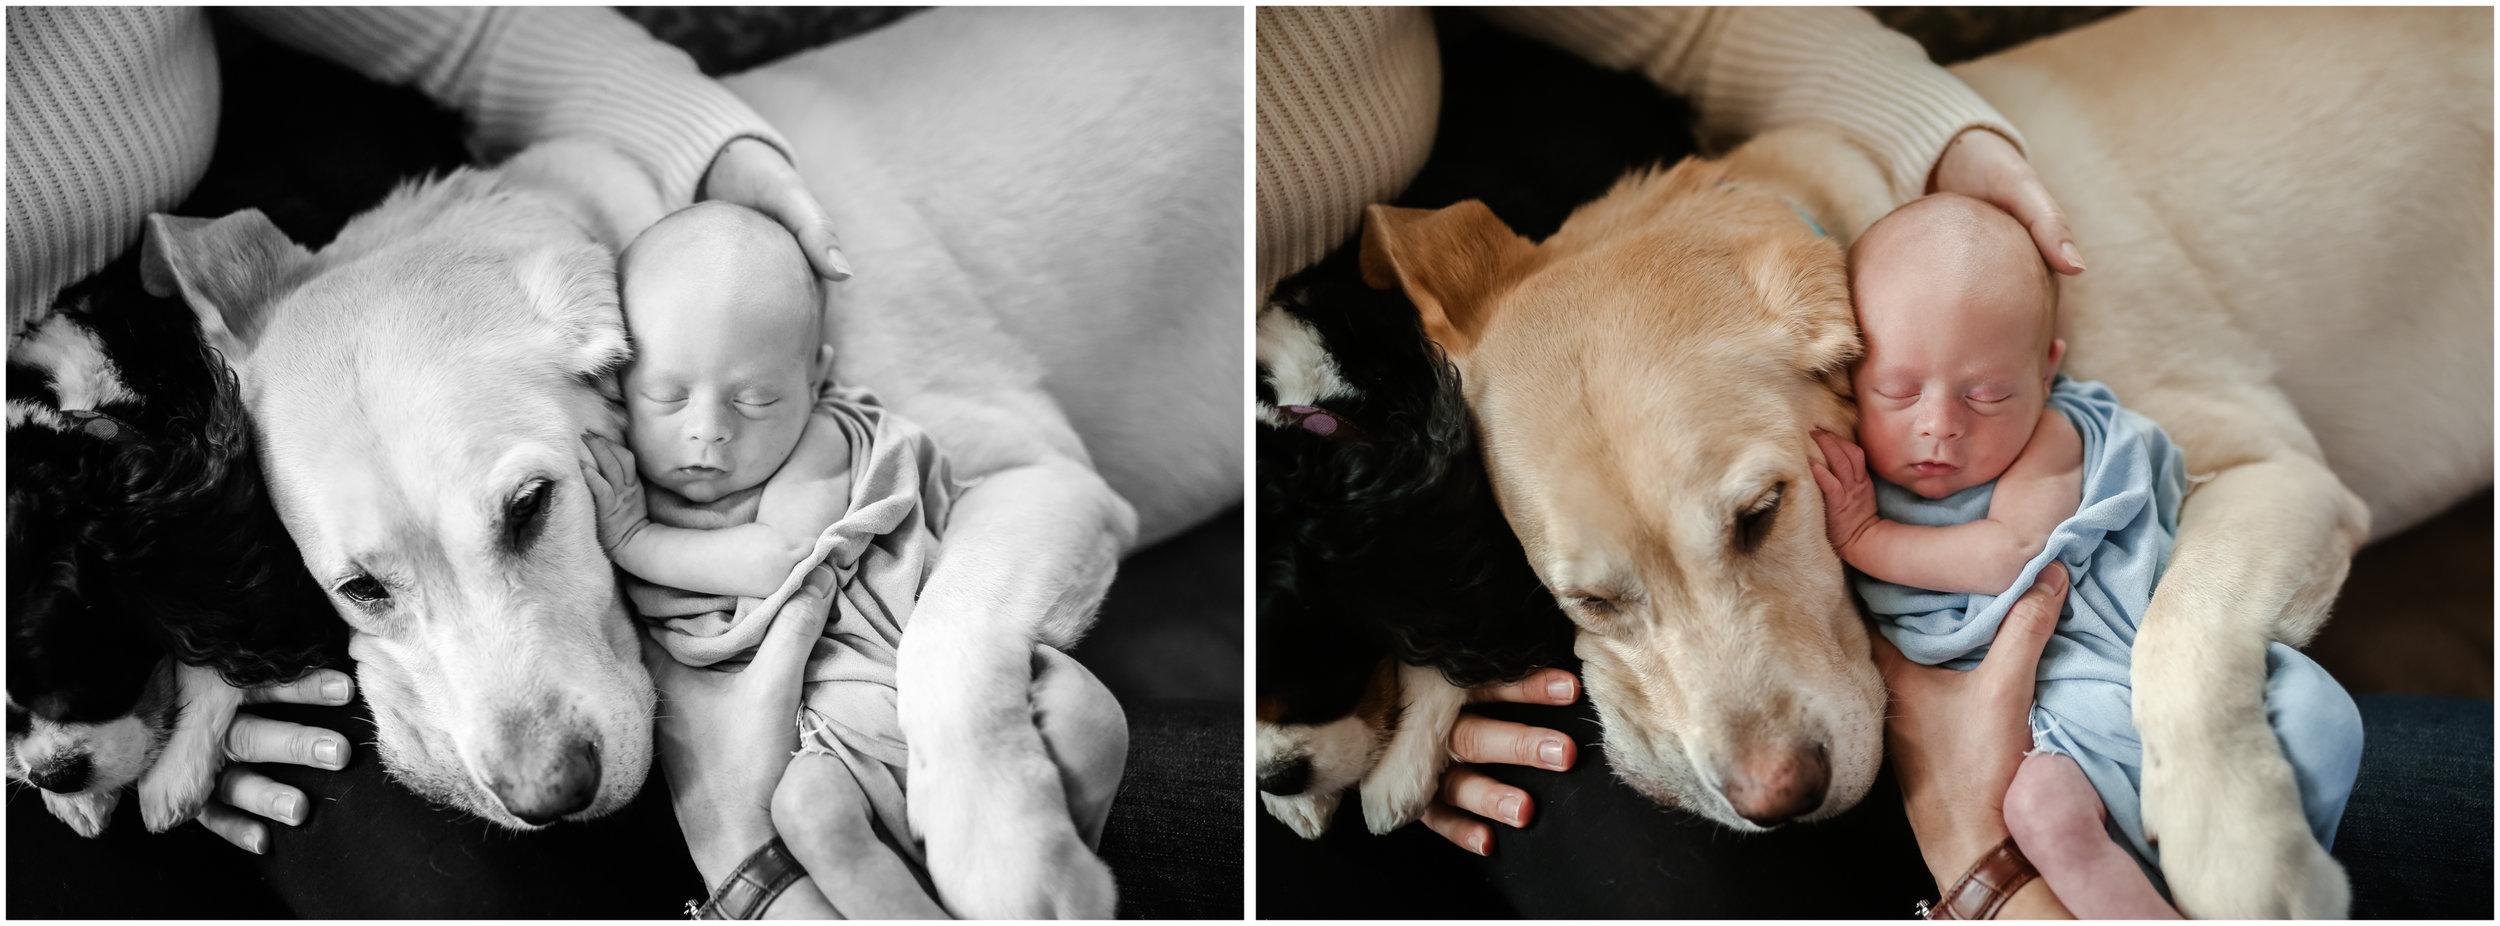 chicago jenny grimm photographer newborn lifestyle family photography